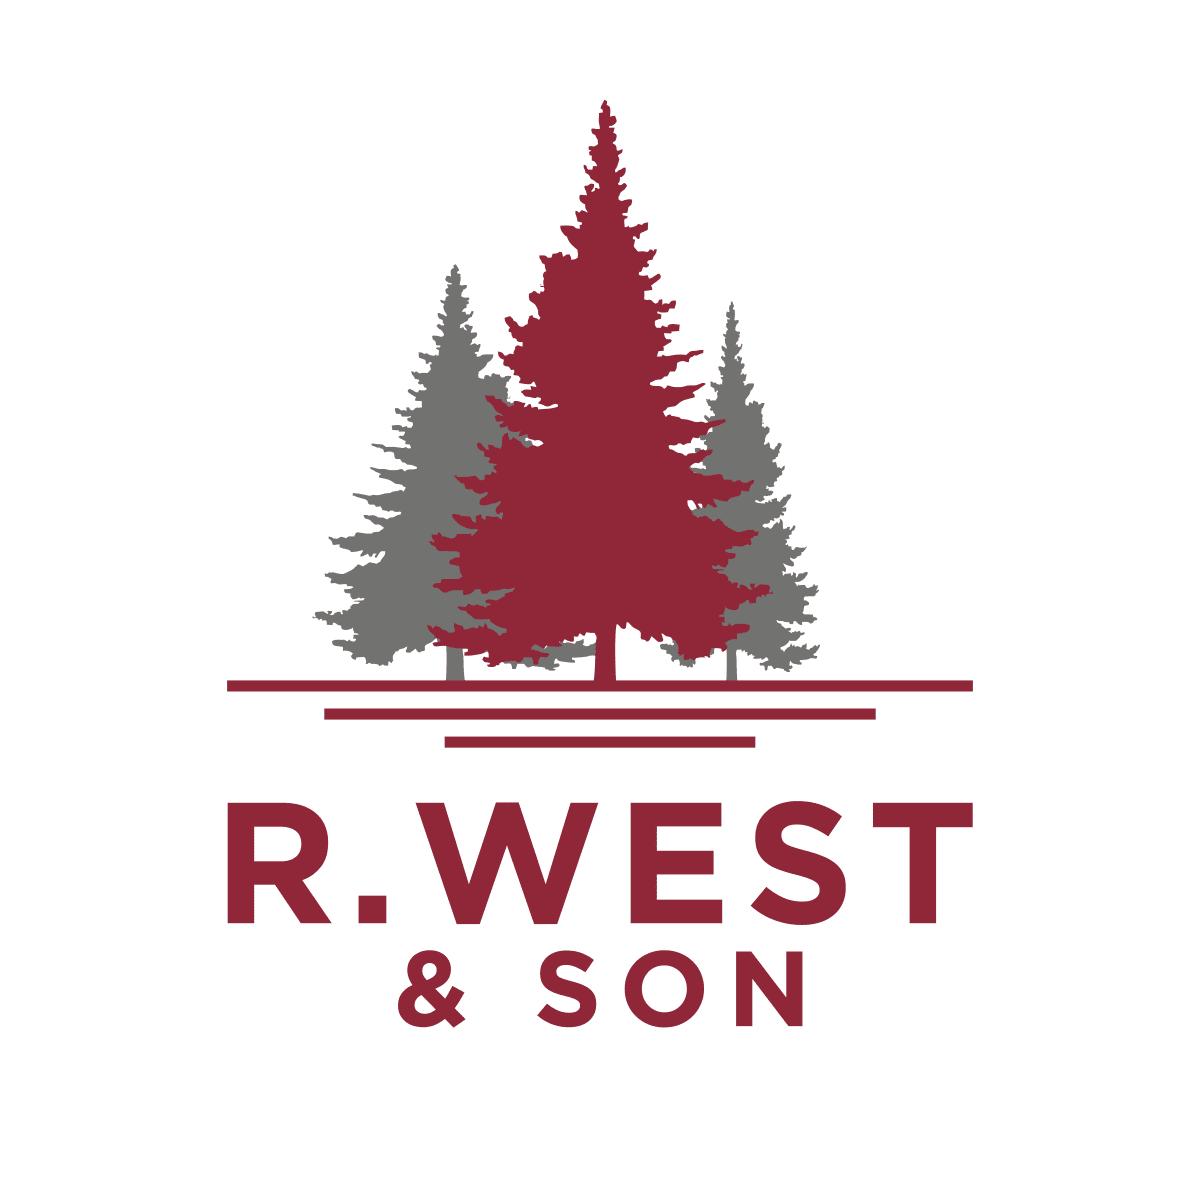 Logo Design Plymouth - R West - Web Design and SEO Company